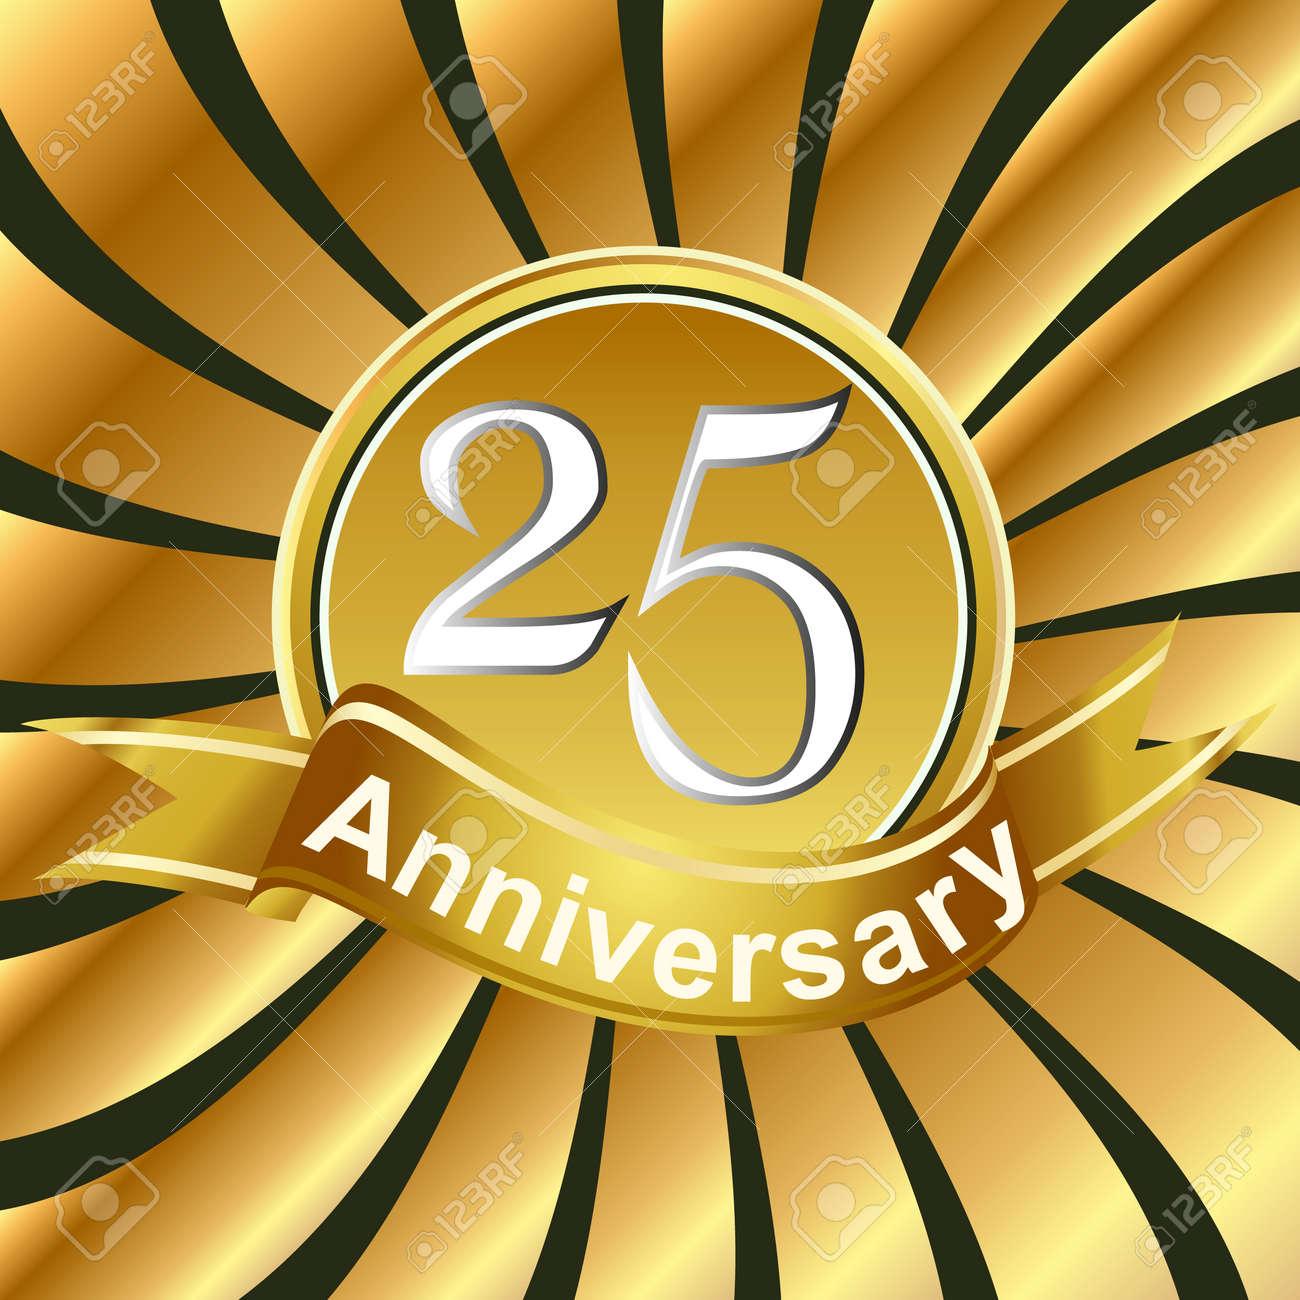 25th anniversary ribbon logo with golden rays of light royalty free rh 123rf com 25th Anniversary Decorations 25th Anniversary Seal